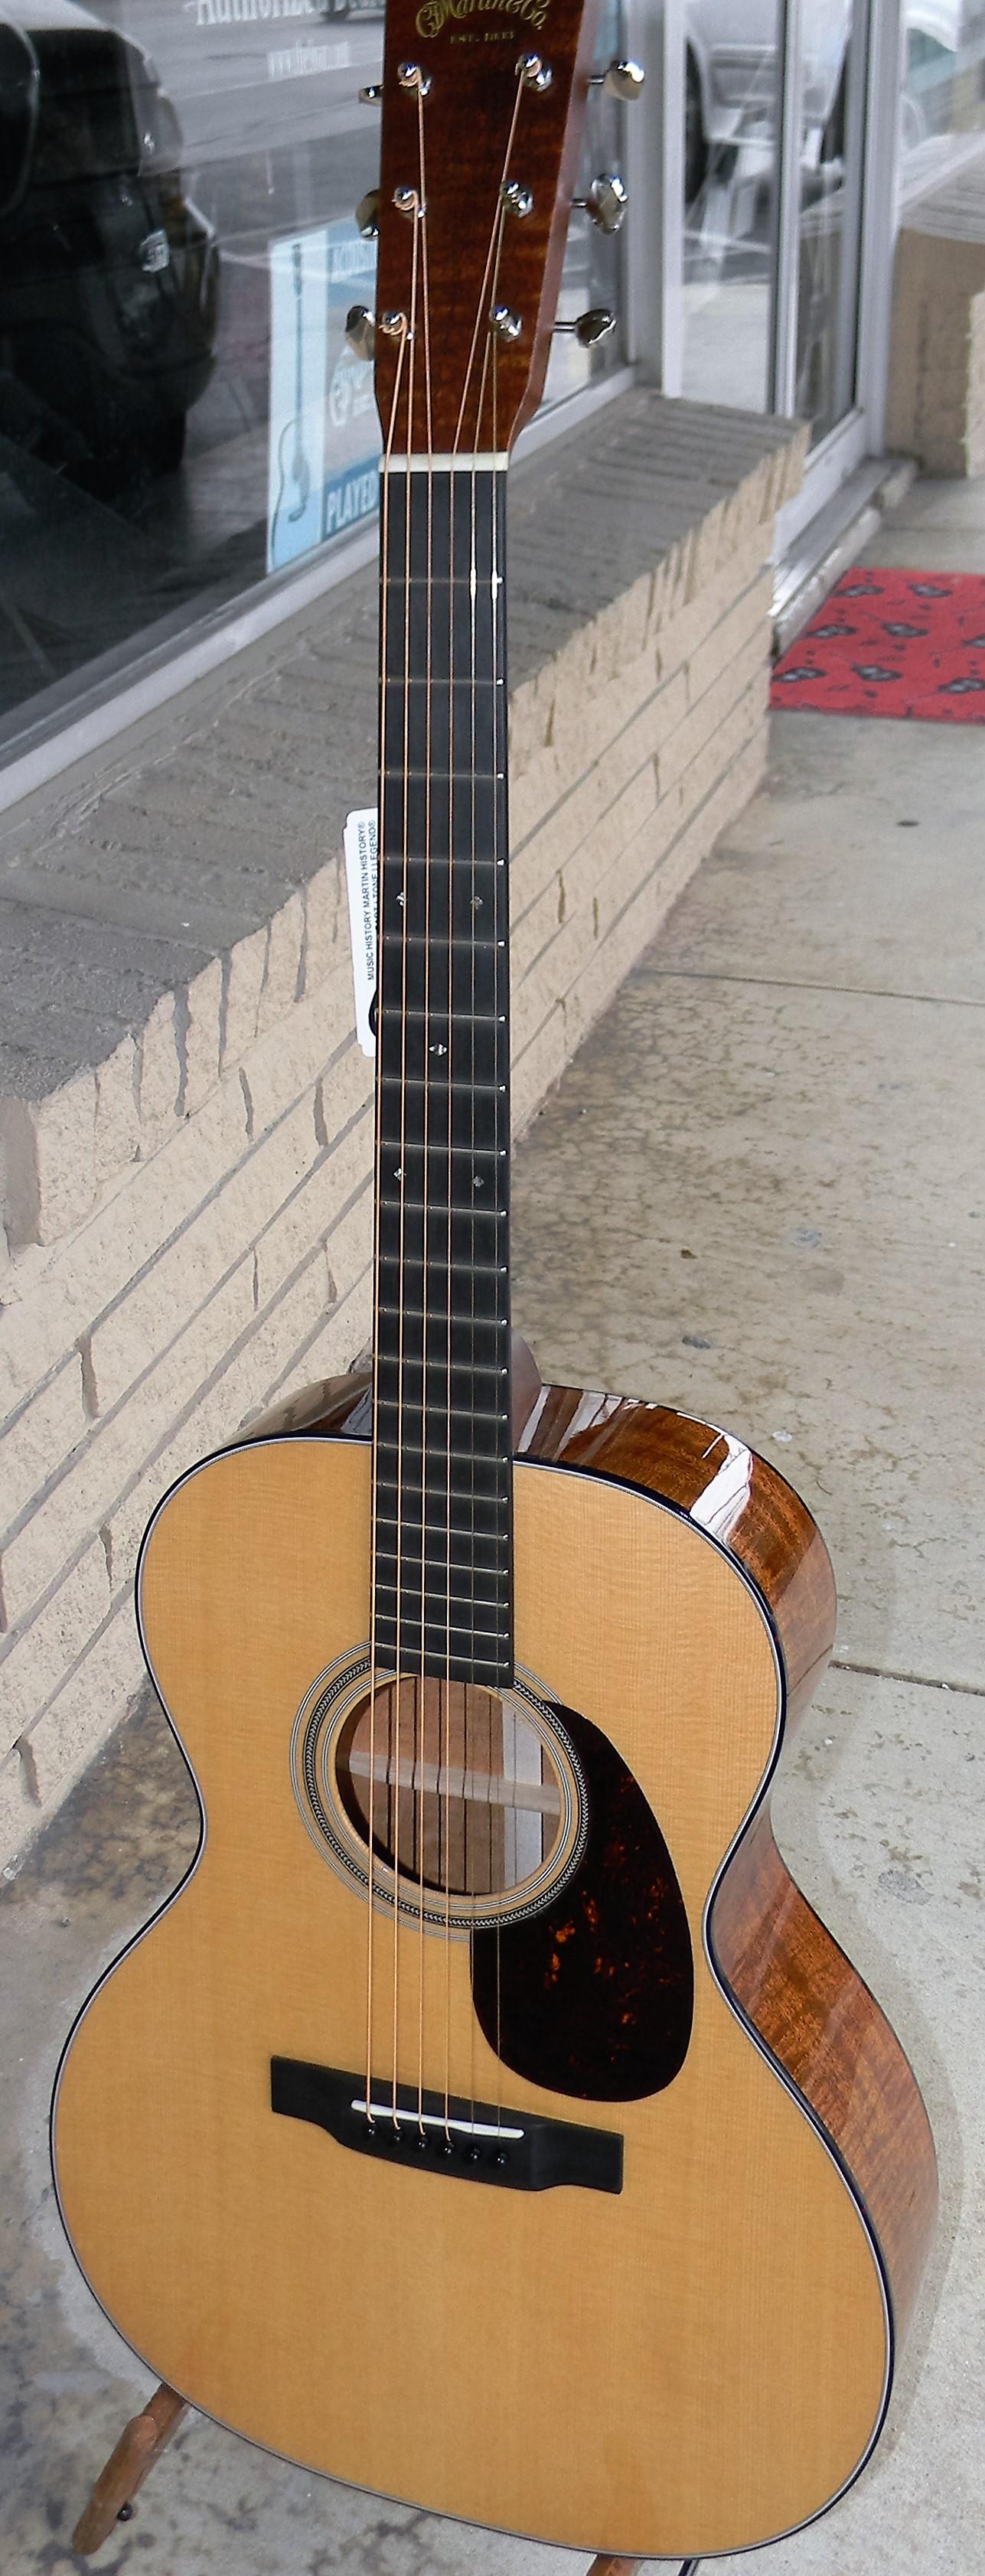 dscn4558 san antonio guitar store guitar tex. Black Bedroom Furniture Sets. Home Design Ideas